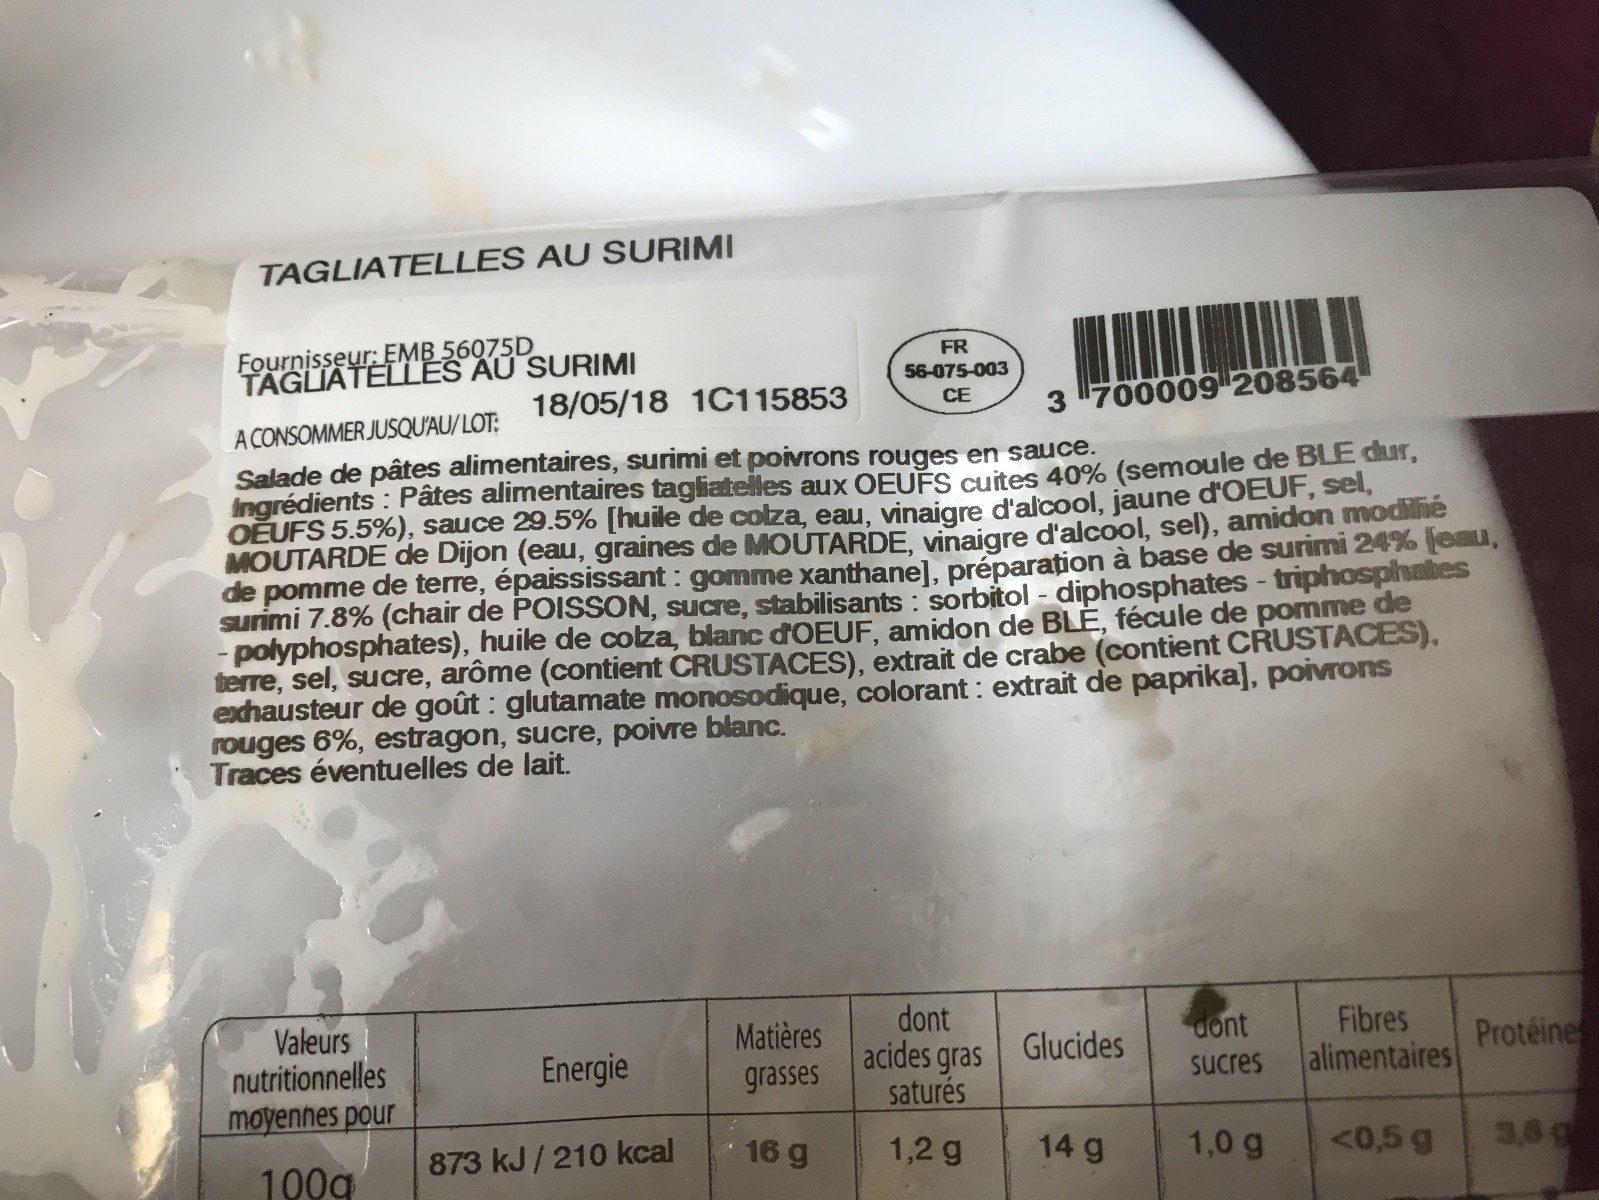 Tagliatelles au Surimi - Ingredients - fr